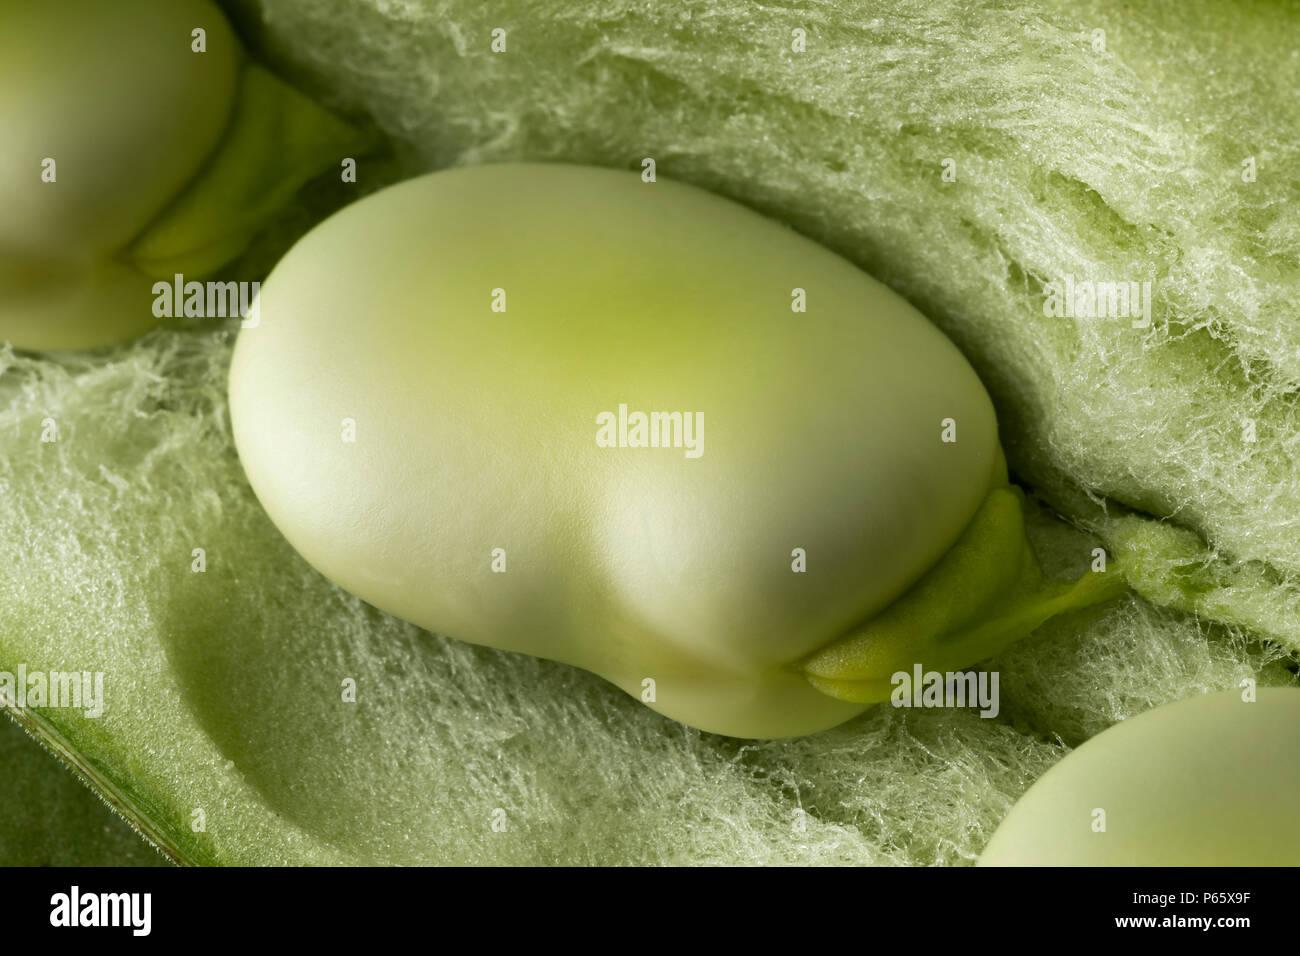 Fresh raw broad bean inside the pod close up full frame - Stock Image